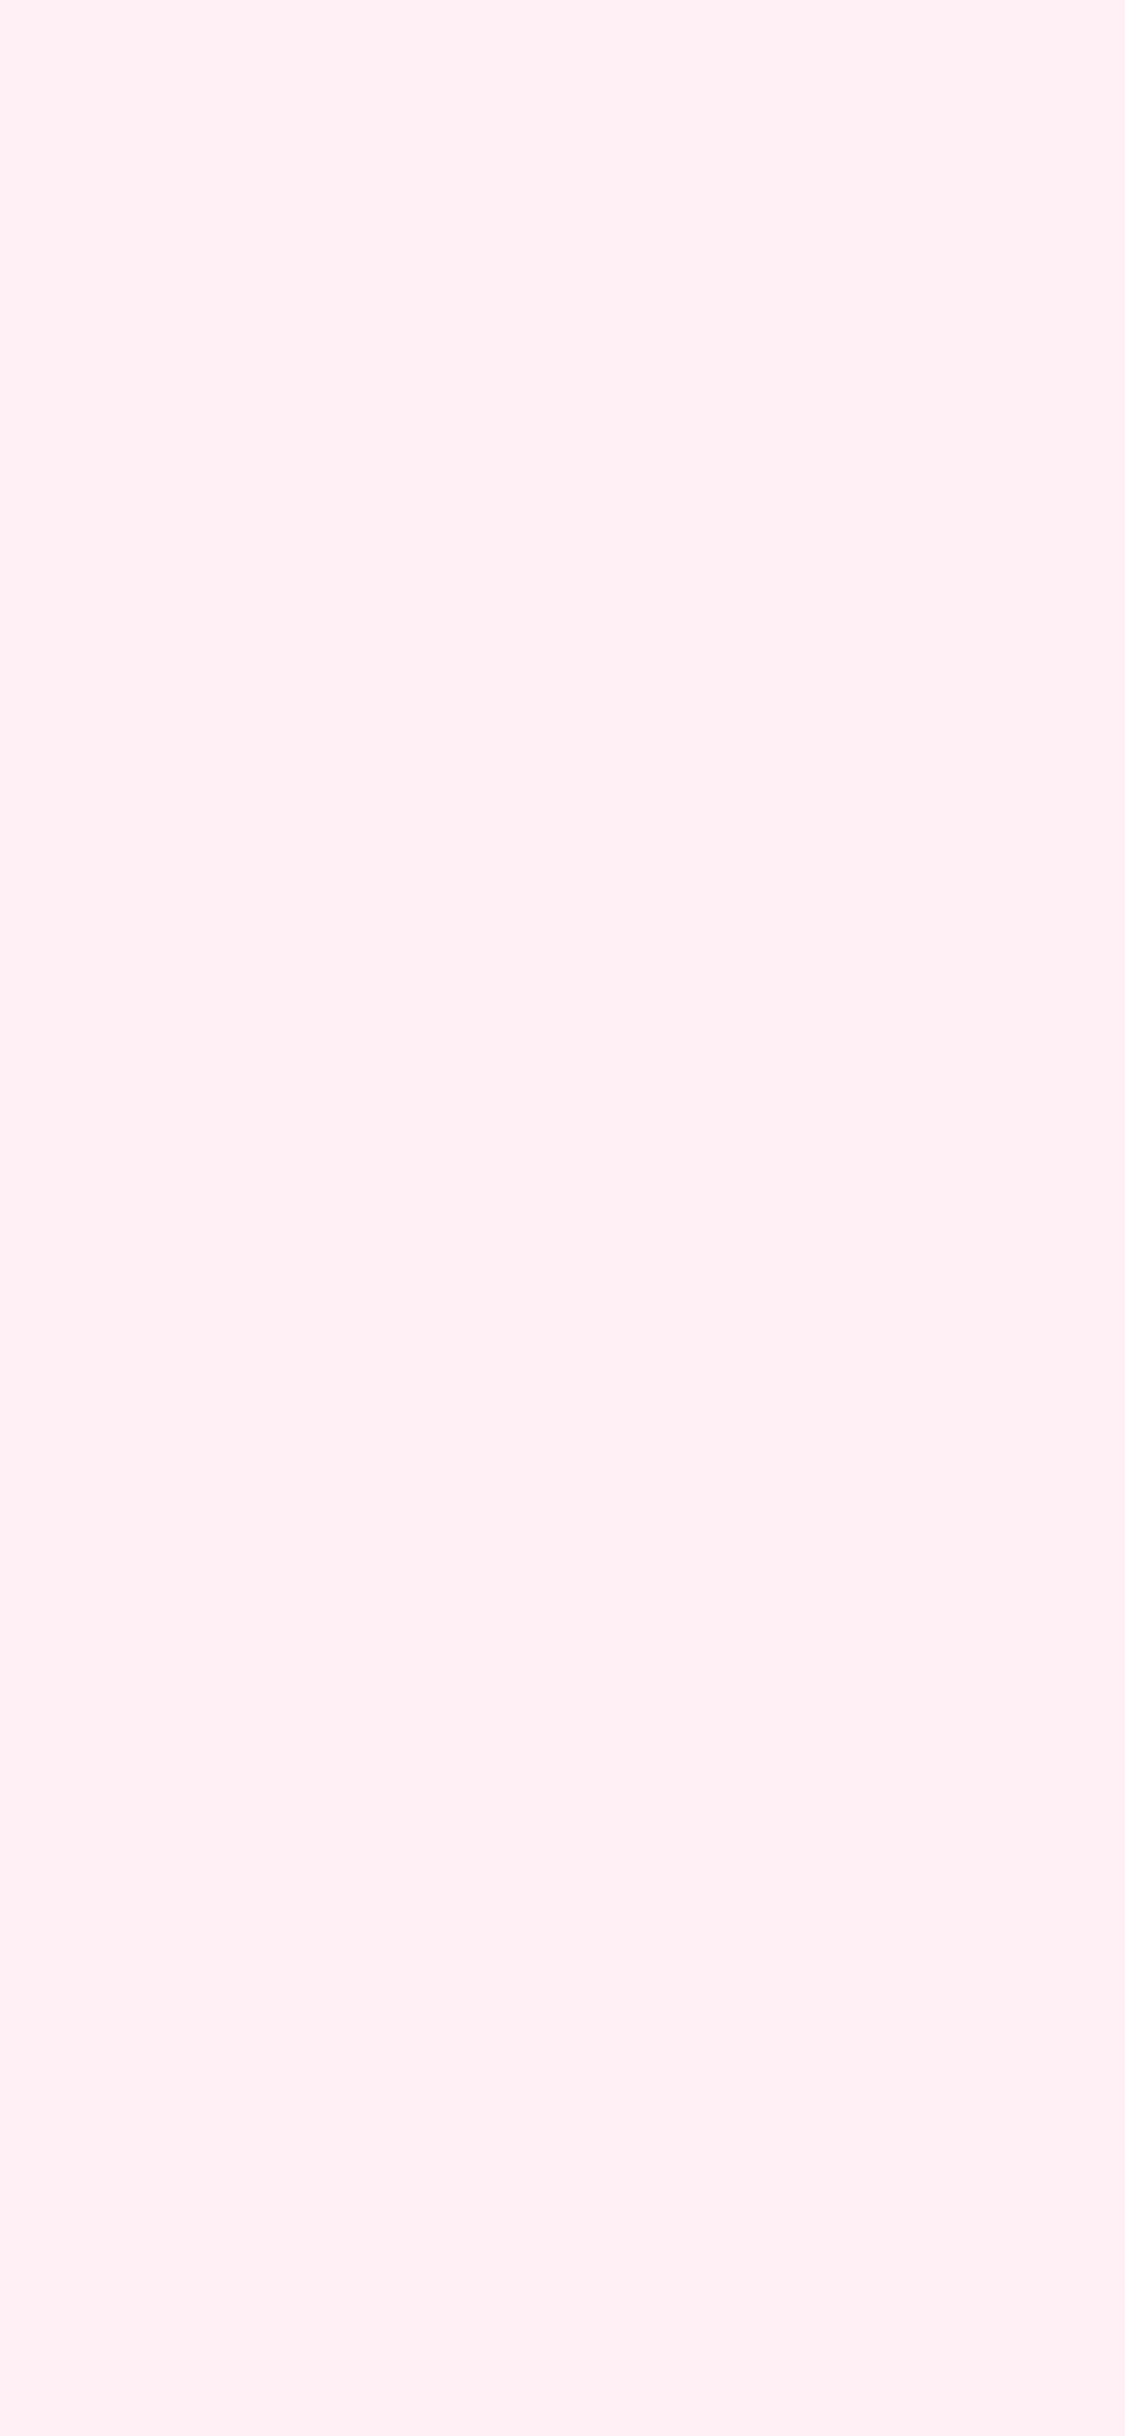 1125x2436 Lavender Blush Solid Color Background